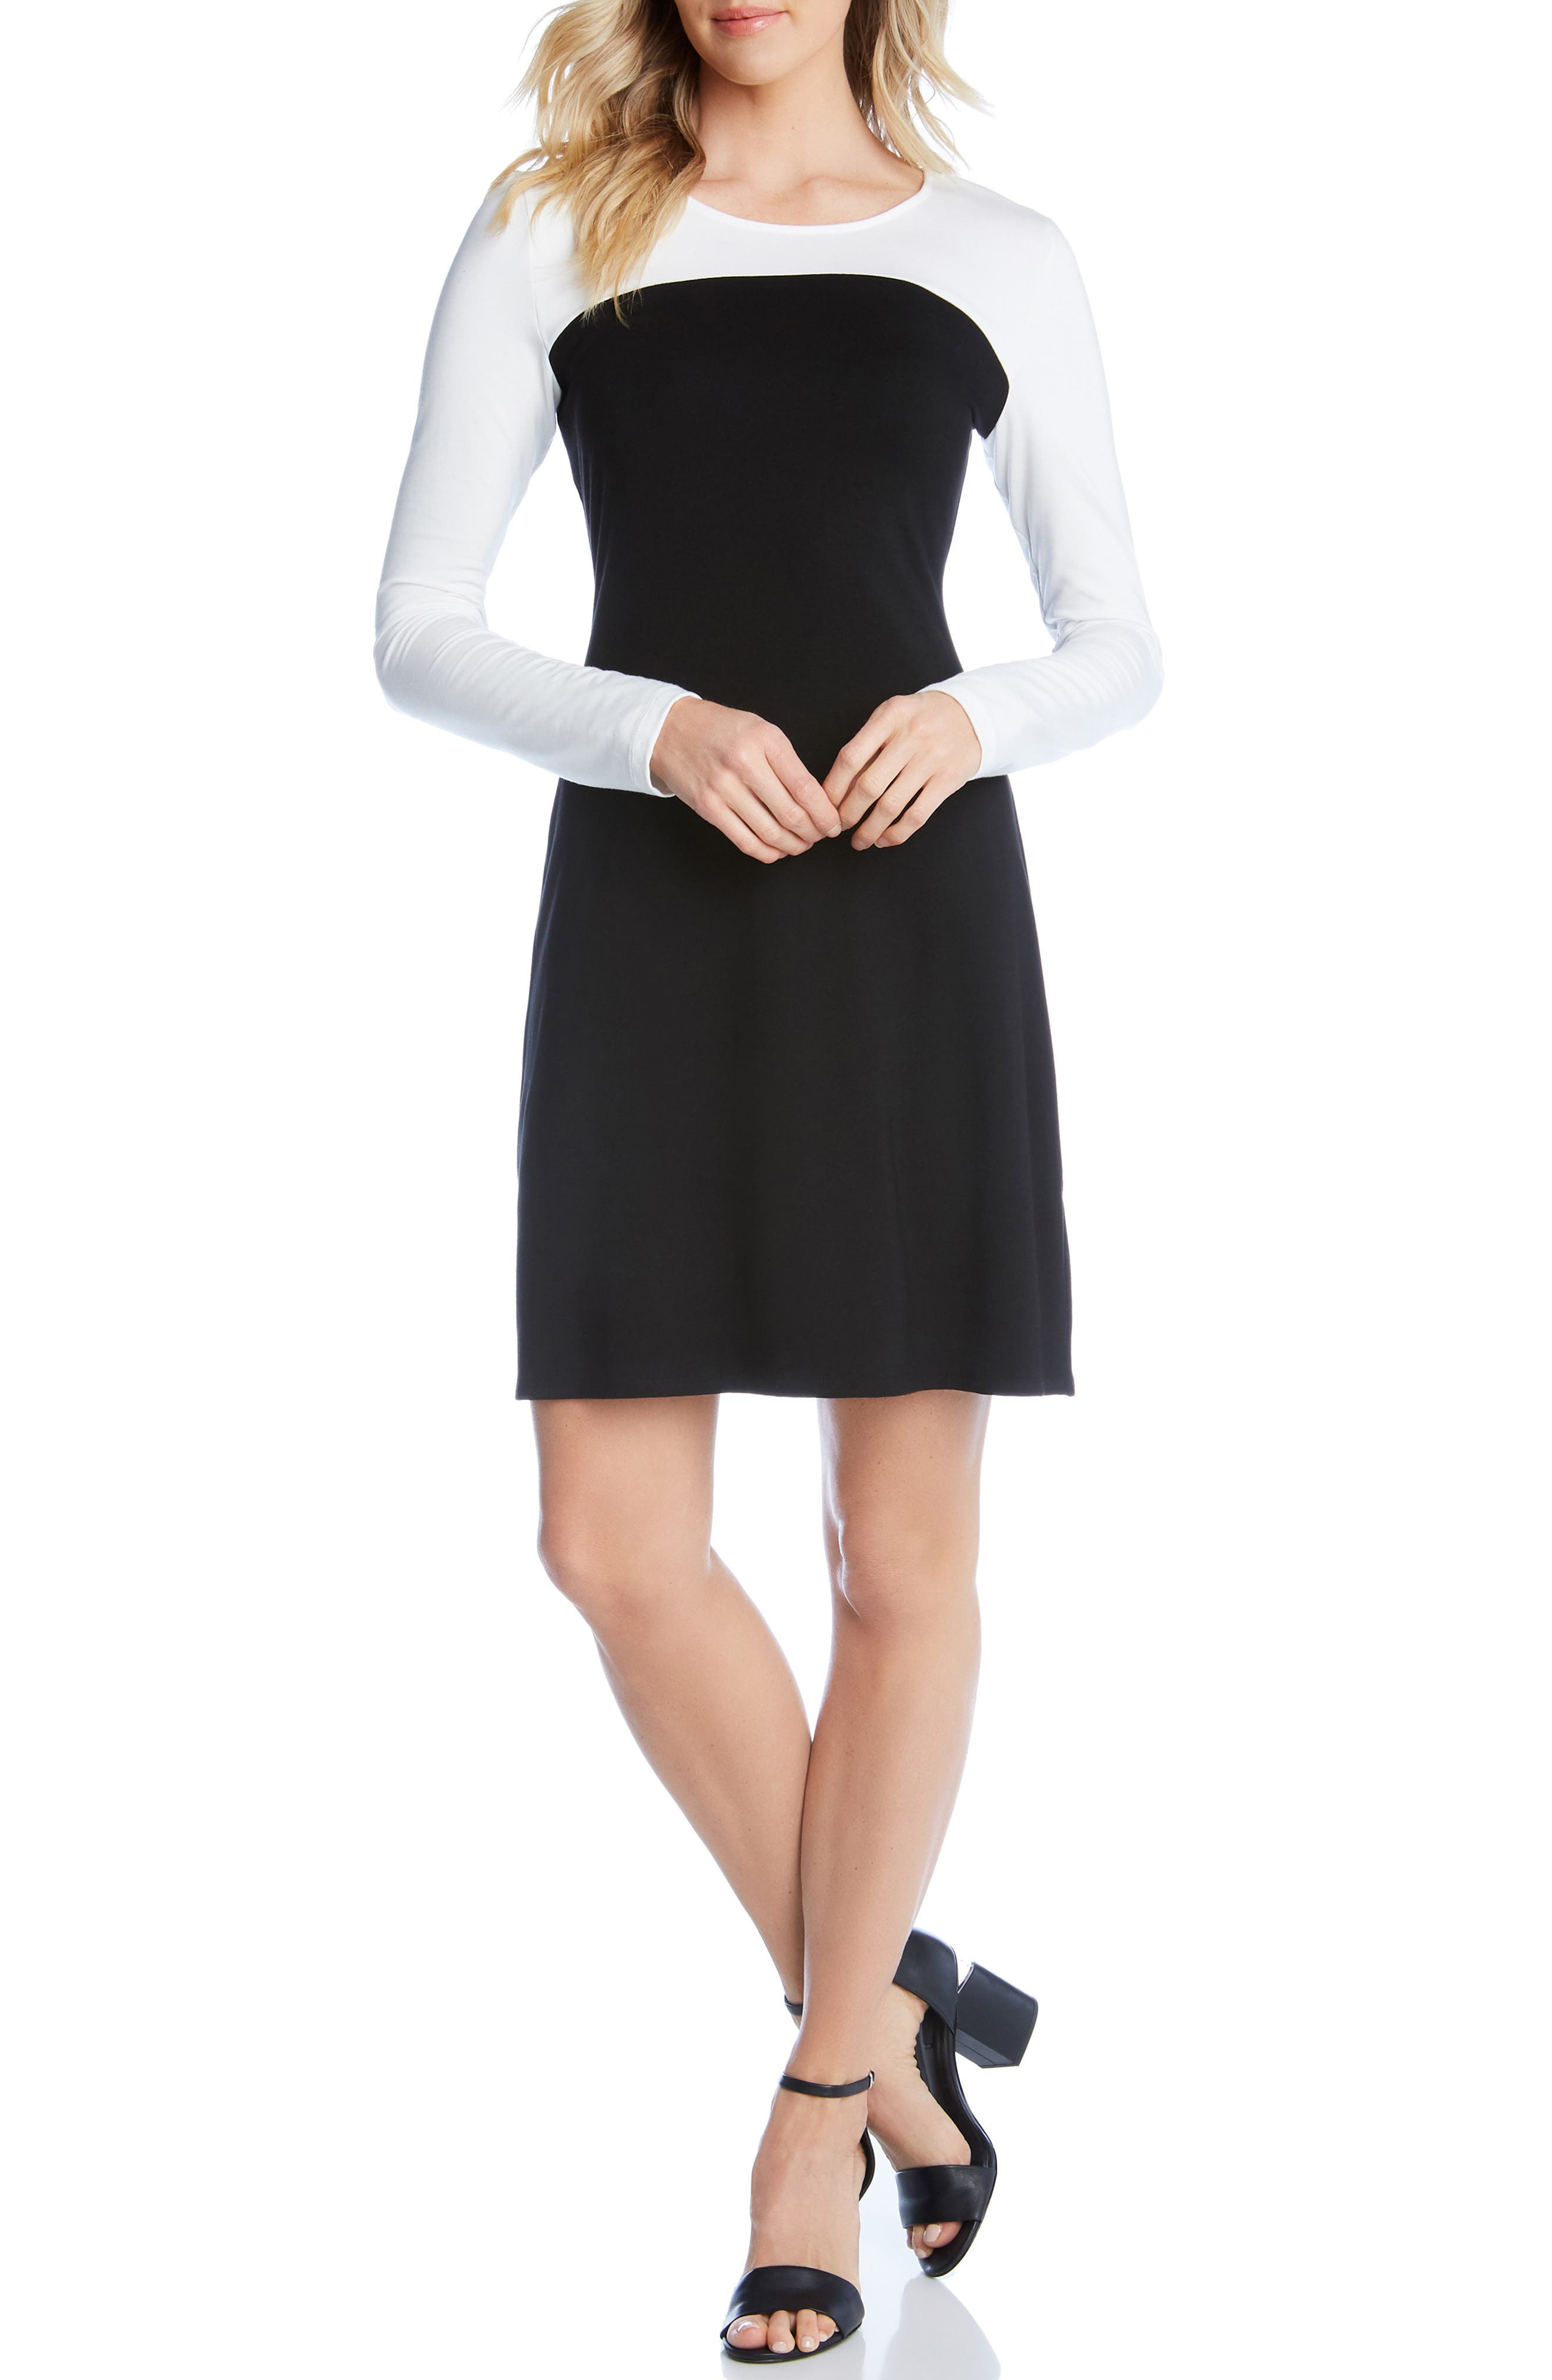 KAREN KANE, Colorblock Sheath Dress, Main thumbnail 1, color, BLACK WITH OFF WHITE